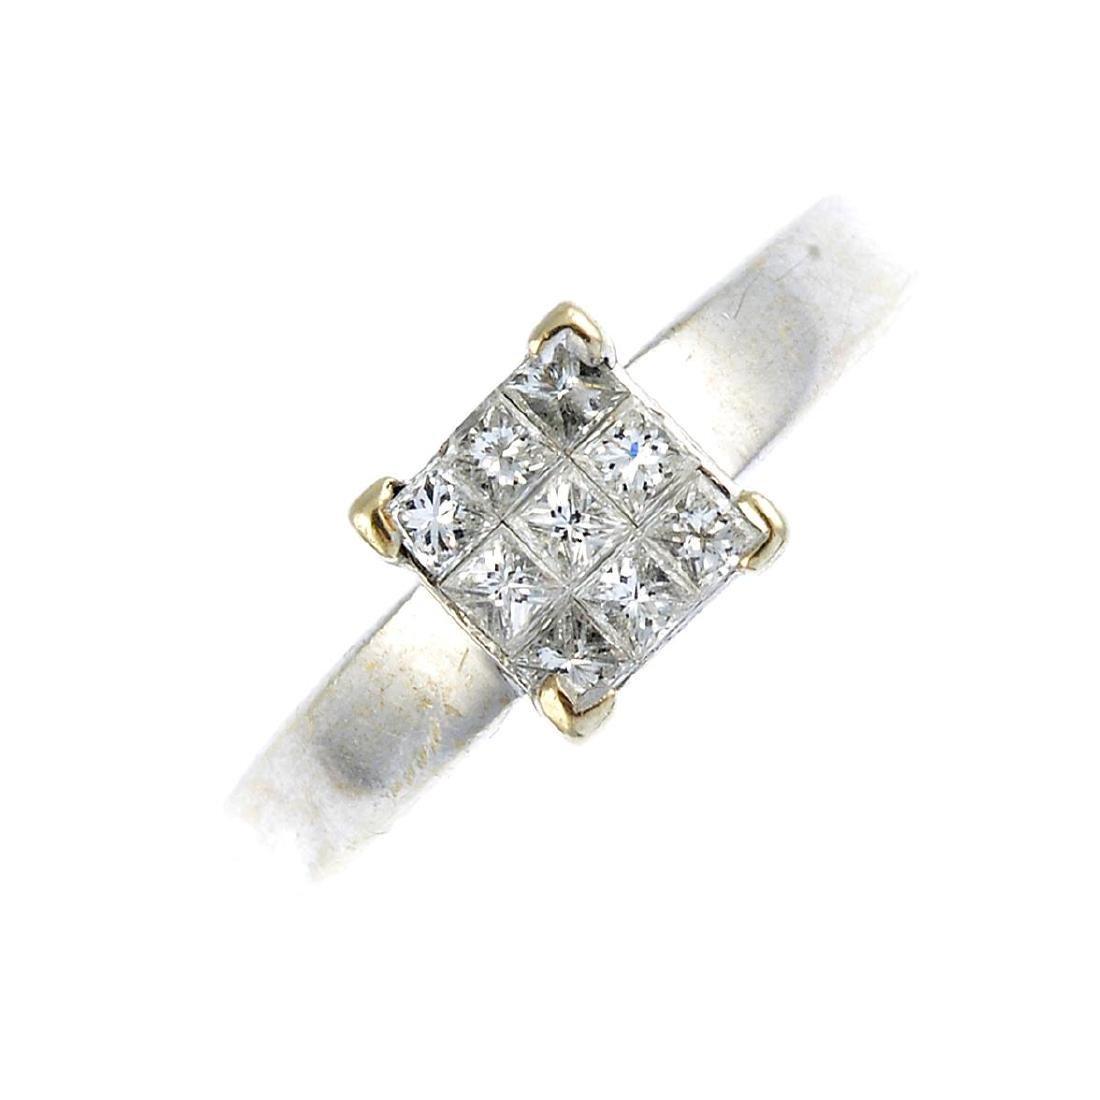 An 18ct gold diamond ring. The square-shape diamond